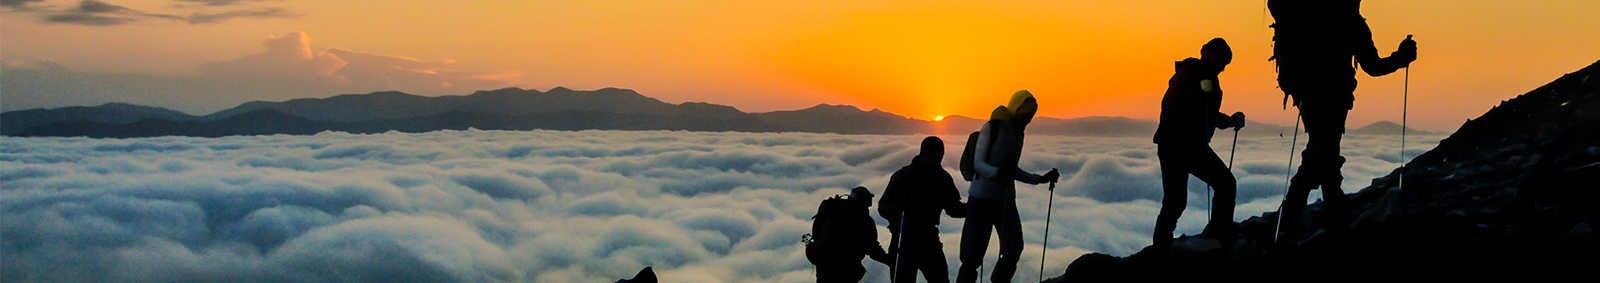 Sunset Mountain Hiking